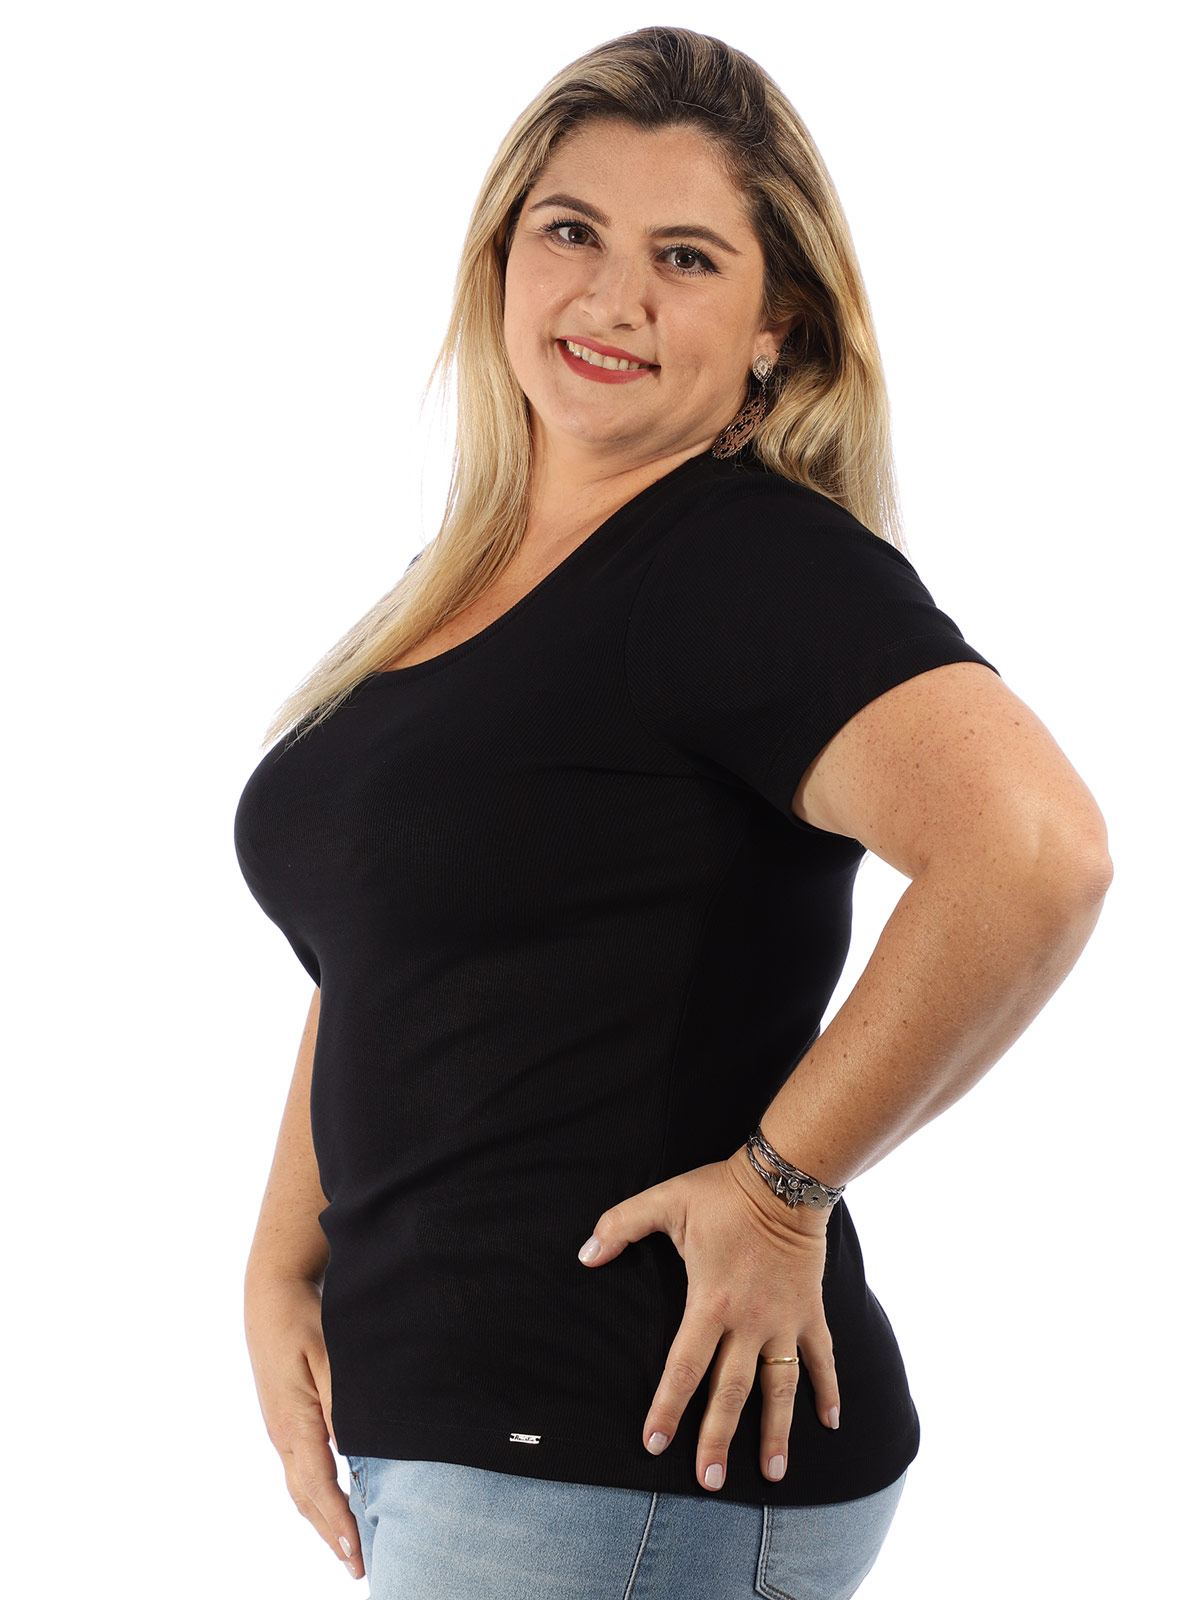 Blusa Plus Size Feminina Visco Canelado Manga Curta Preta